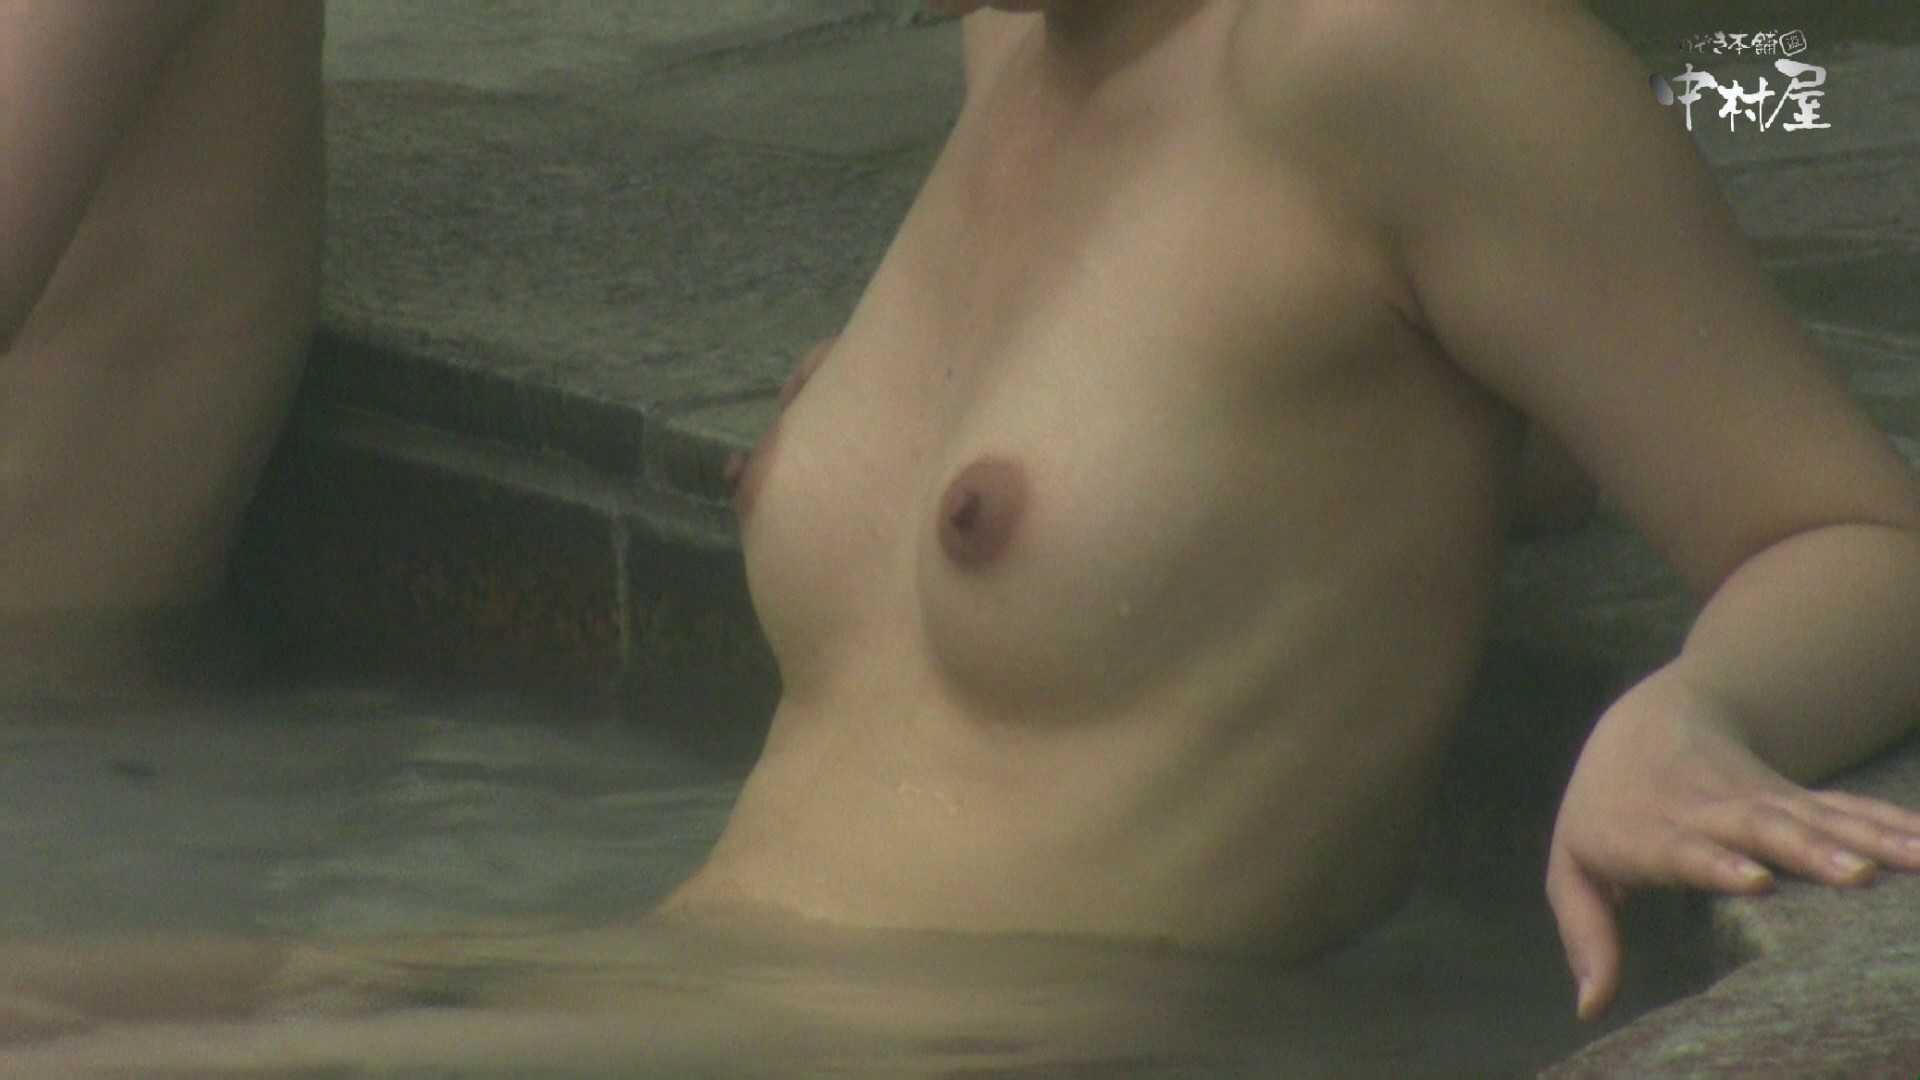 Aquaな露天風呂Vol.890 露天 おまんこ動画流出 51画像 35